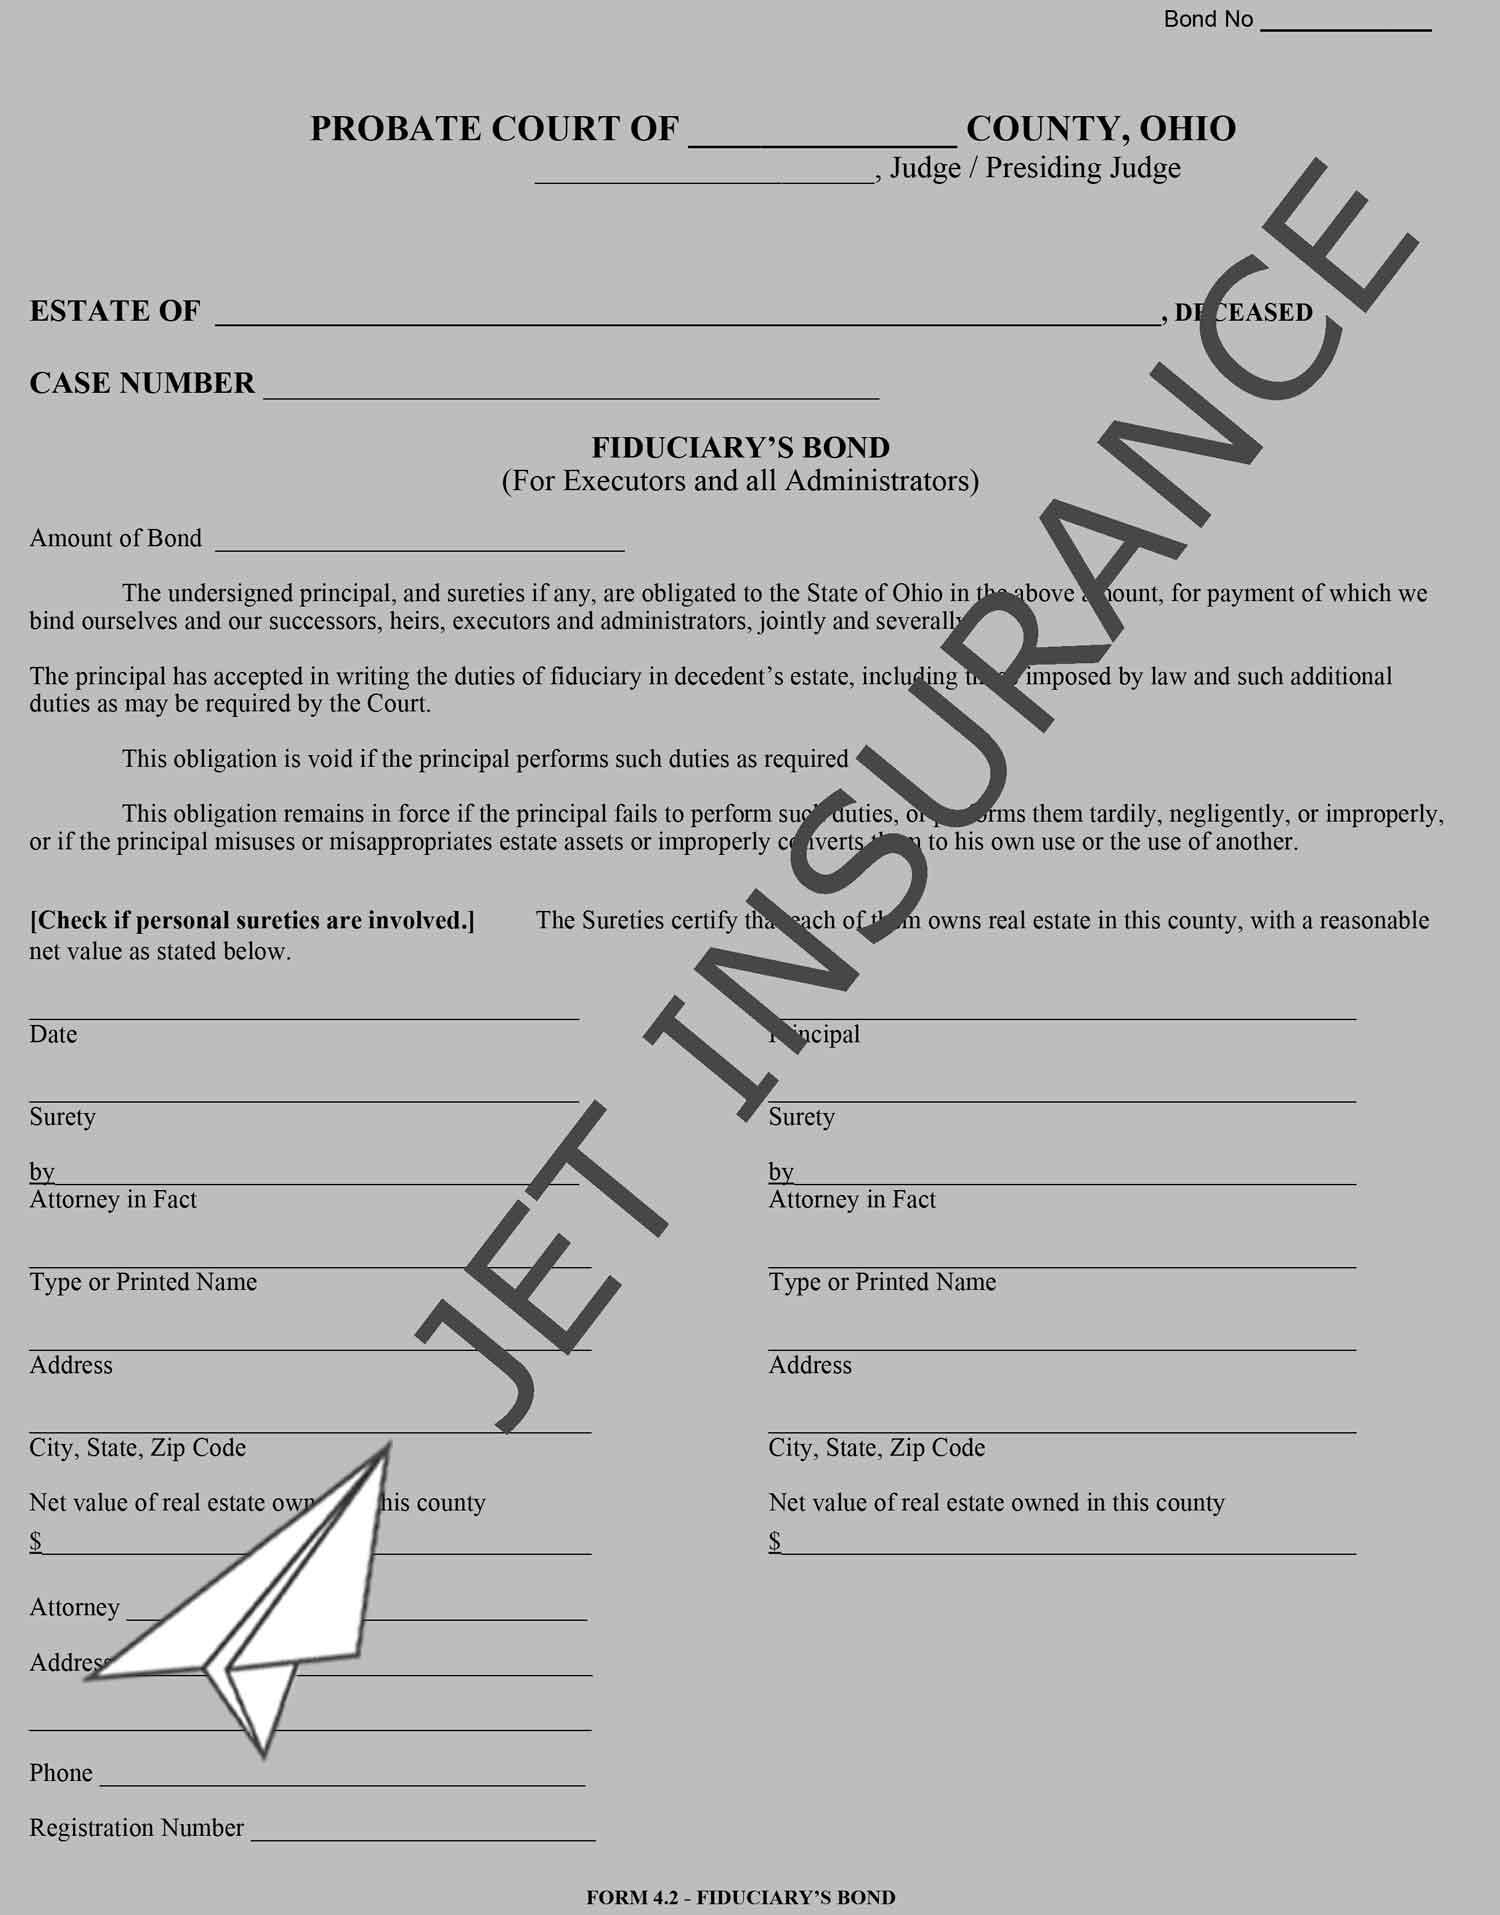 Ohio Administrator and Executor Bond Form